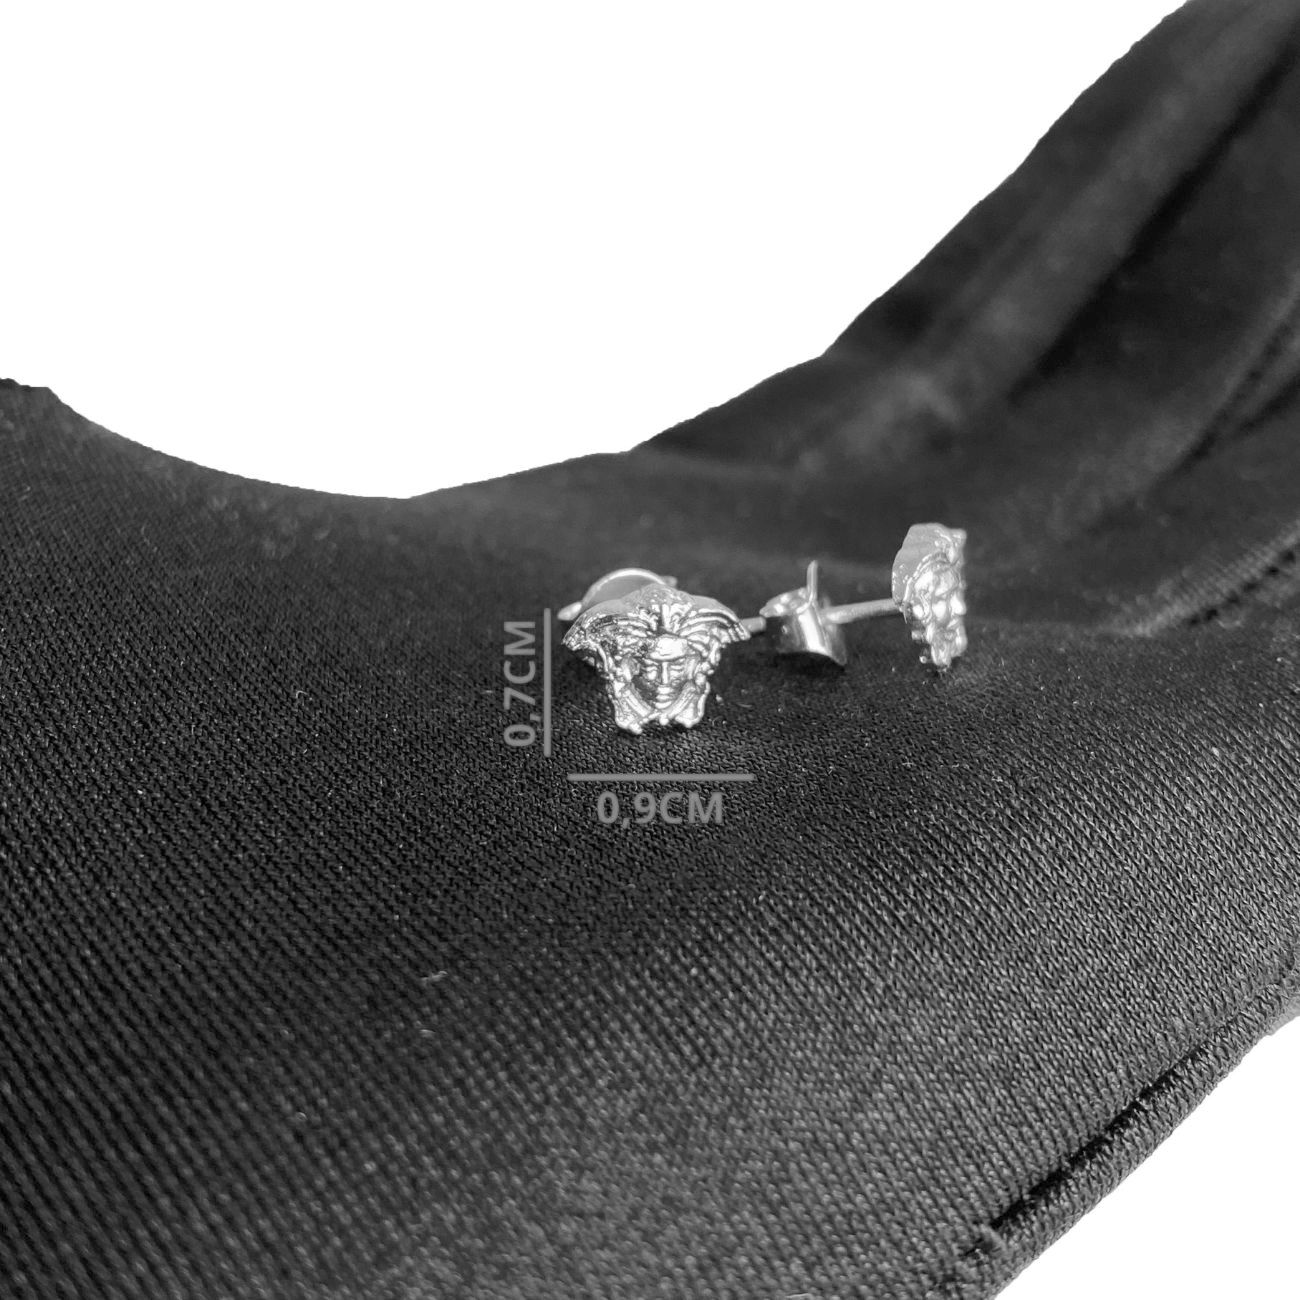 Brinco Rosto Medusa (0,7cmX0,9cm) (Banho Prata 925)